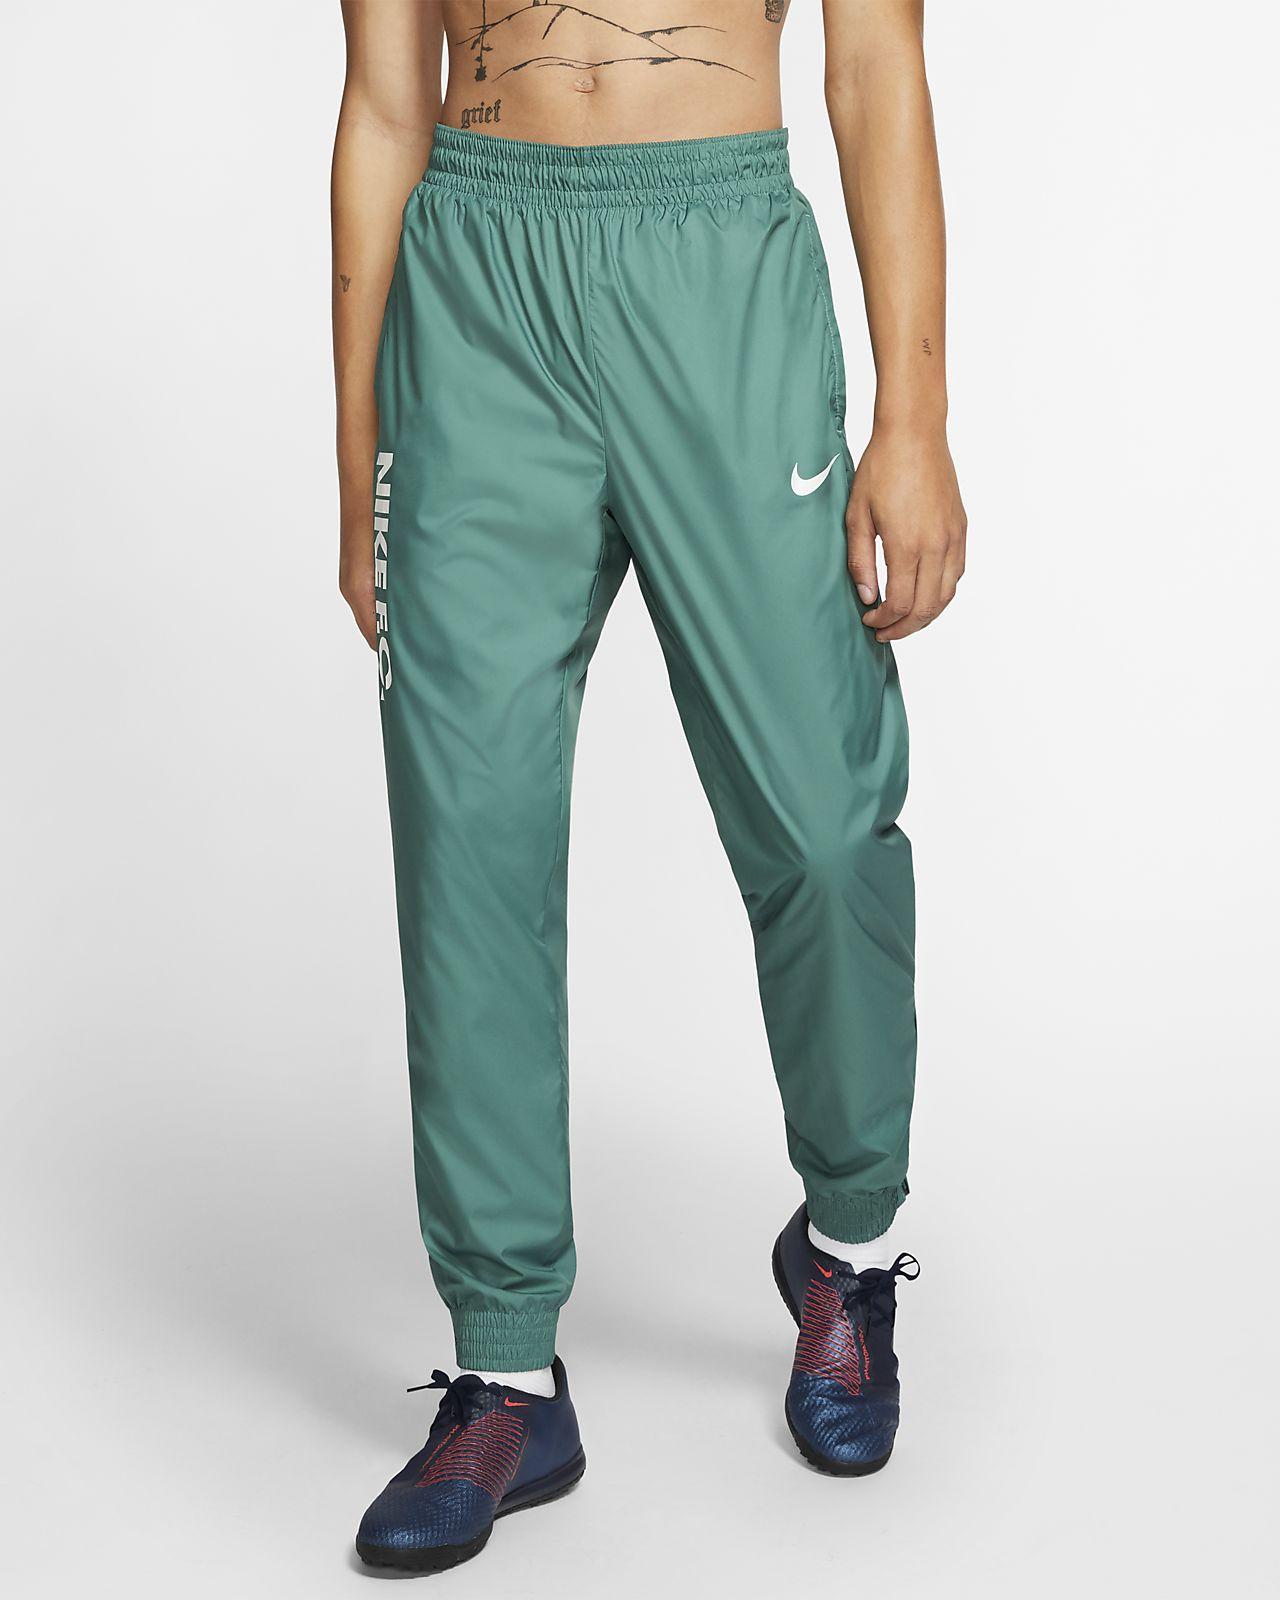 Nike F.C. férfi futballnadrág